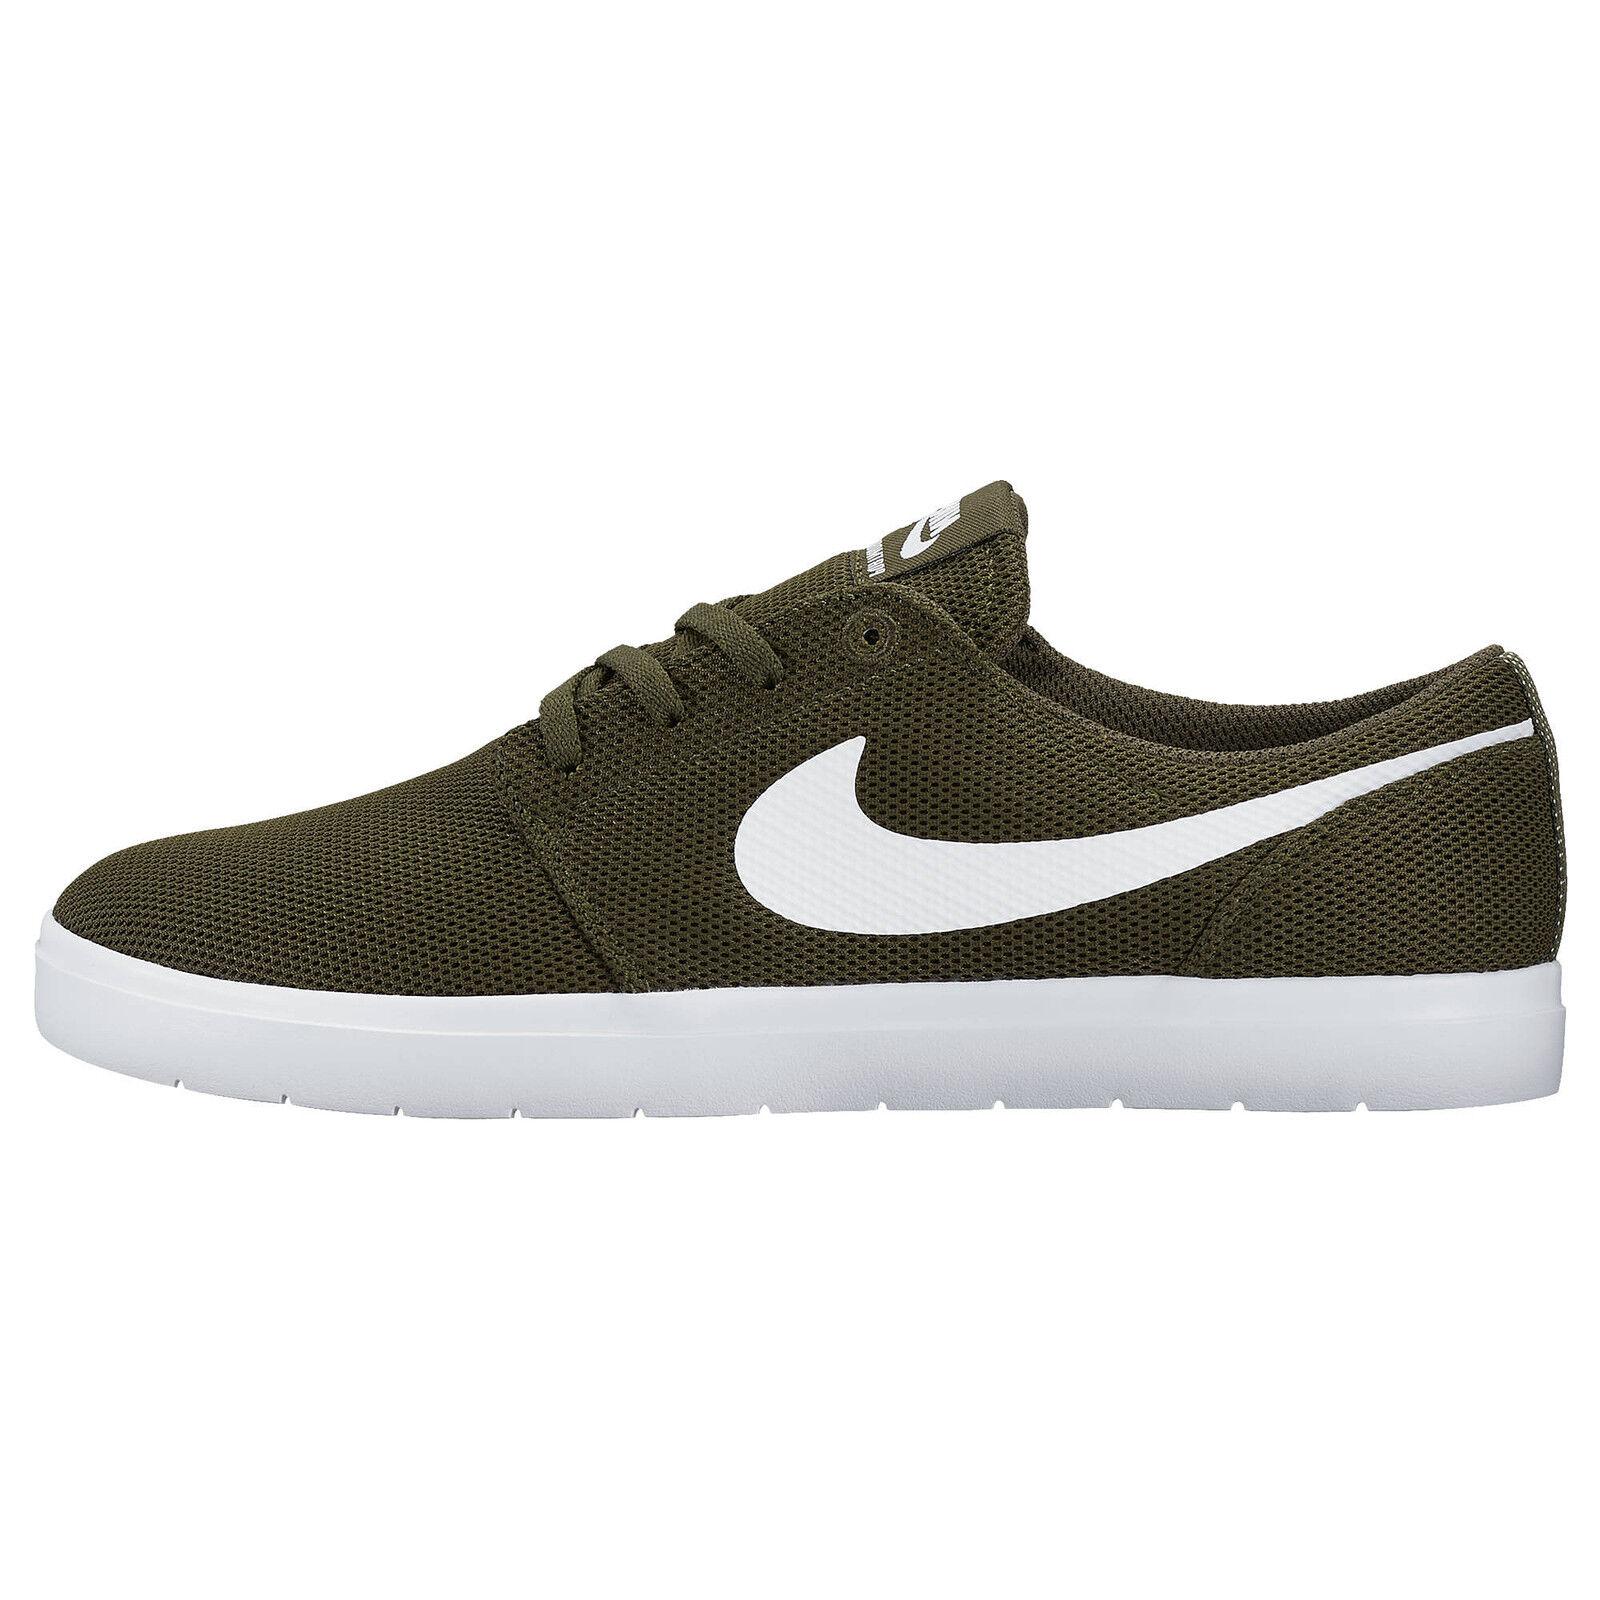 Nike SB Portmore II Ultralight 880271-311 Skate Shoe Casual Shoes Trainers